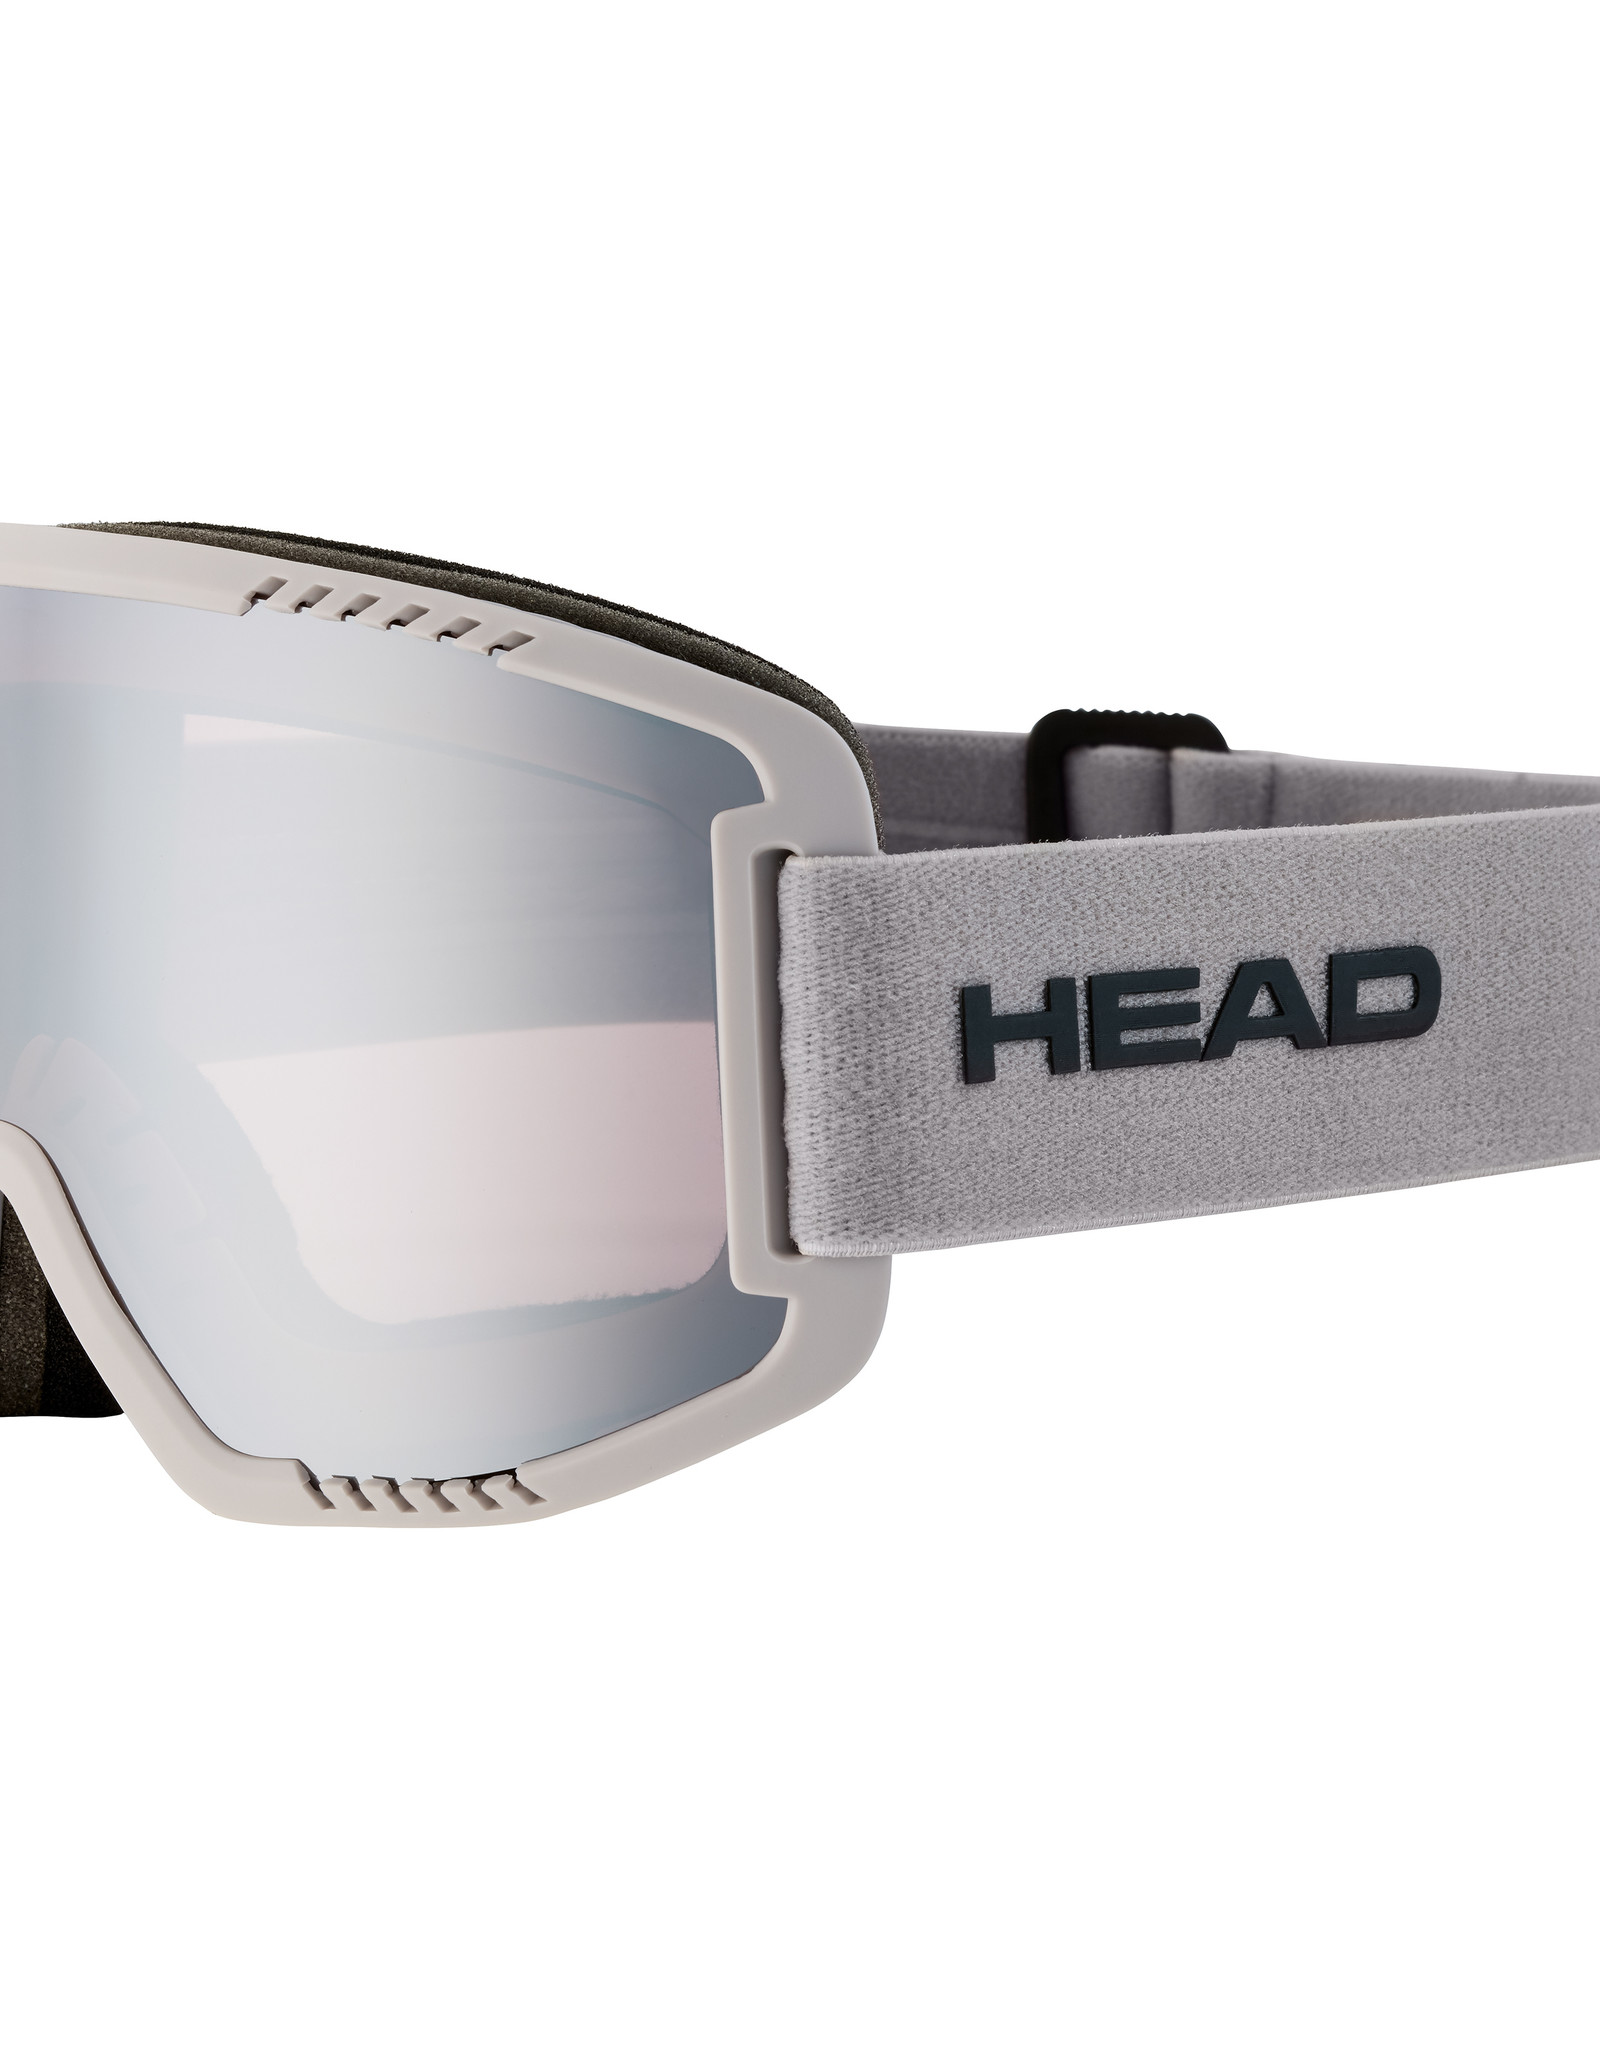 Head Contex Pro 5K -W2022